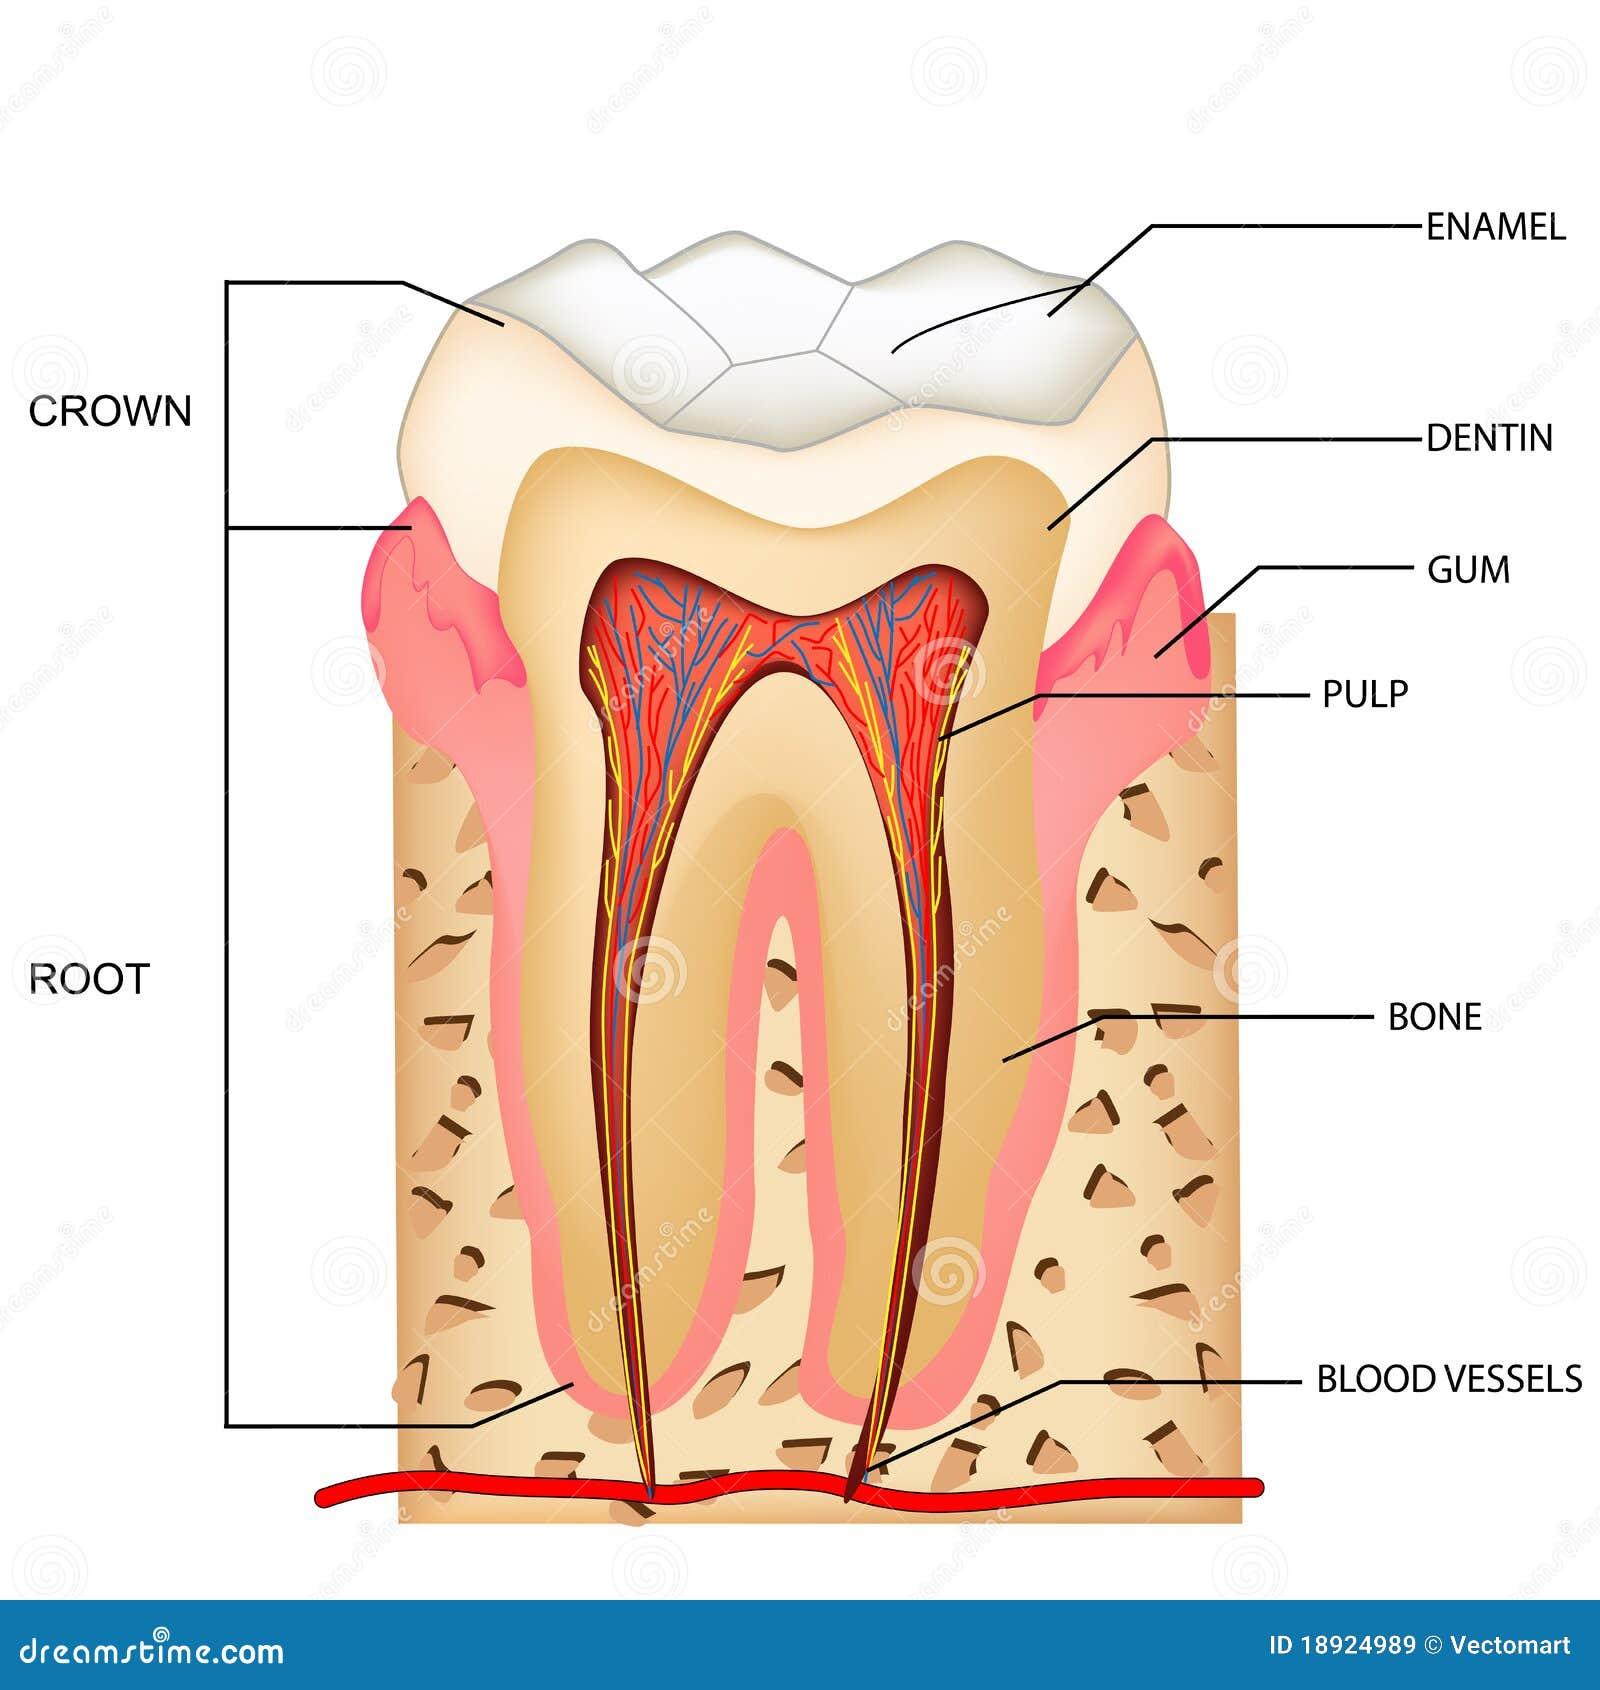 Teeth Anatomy stock vector. Illustration of enamel, dentin - 18924989